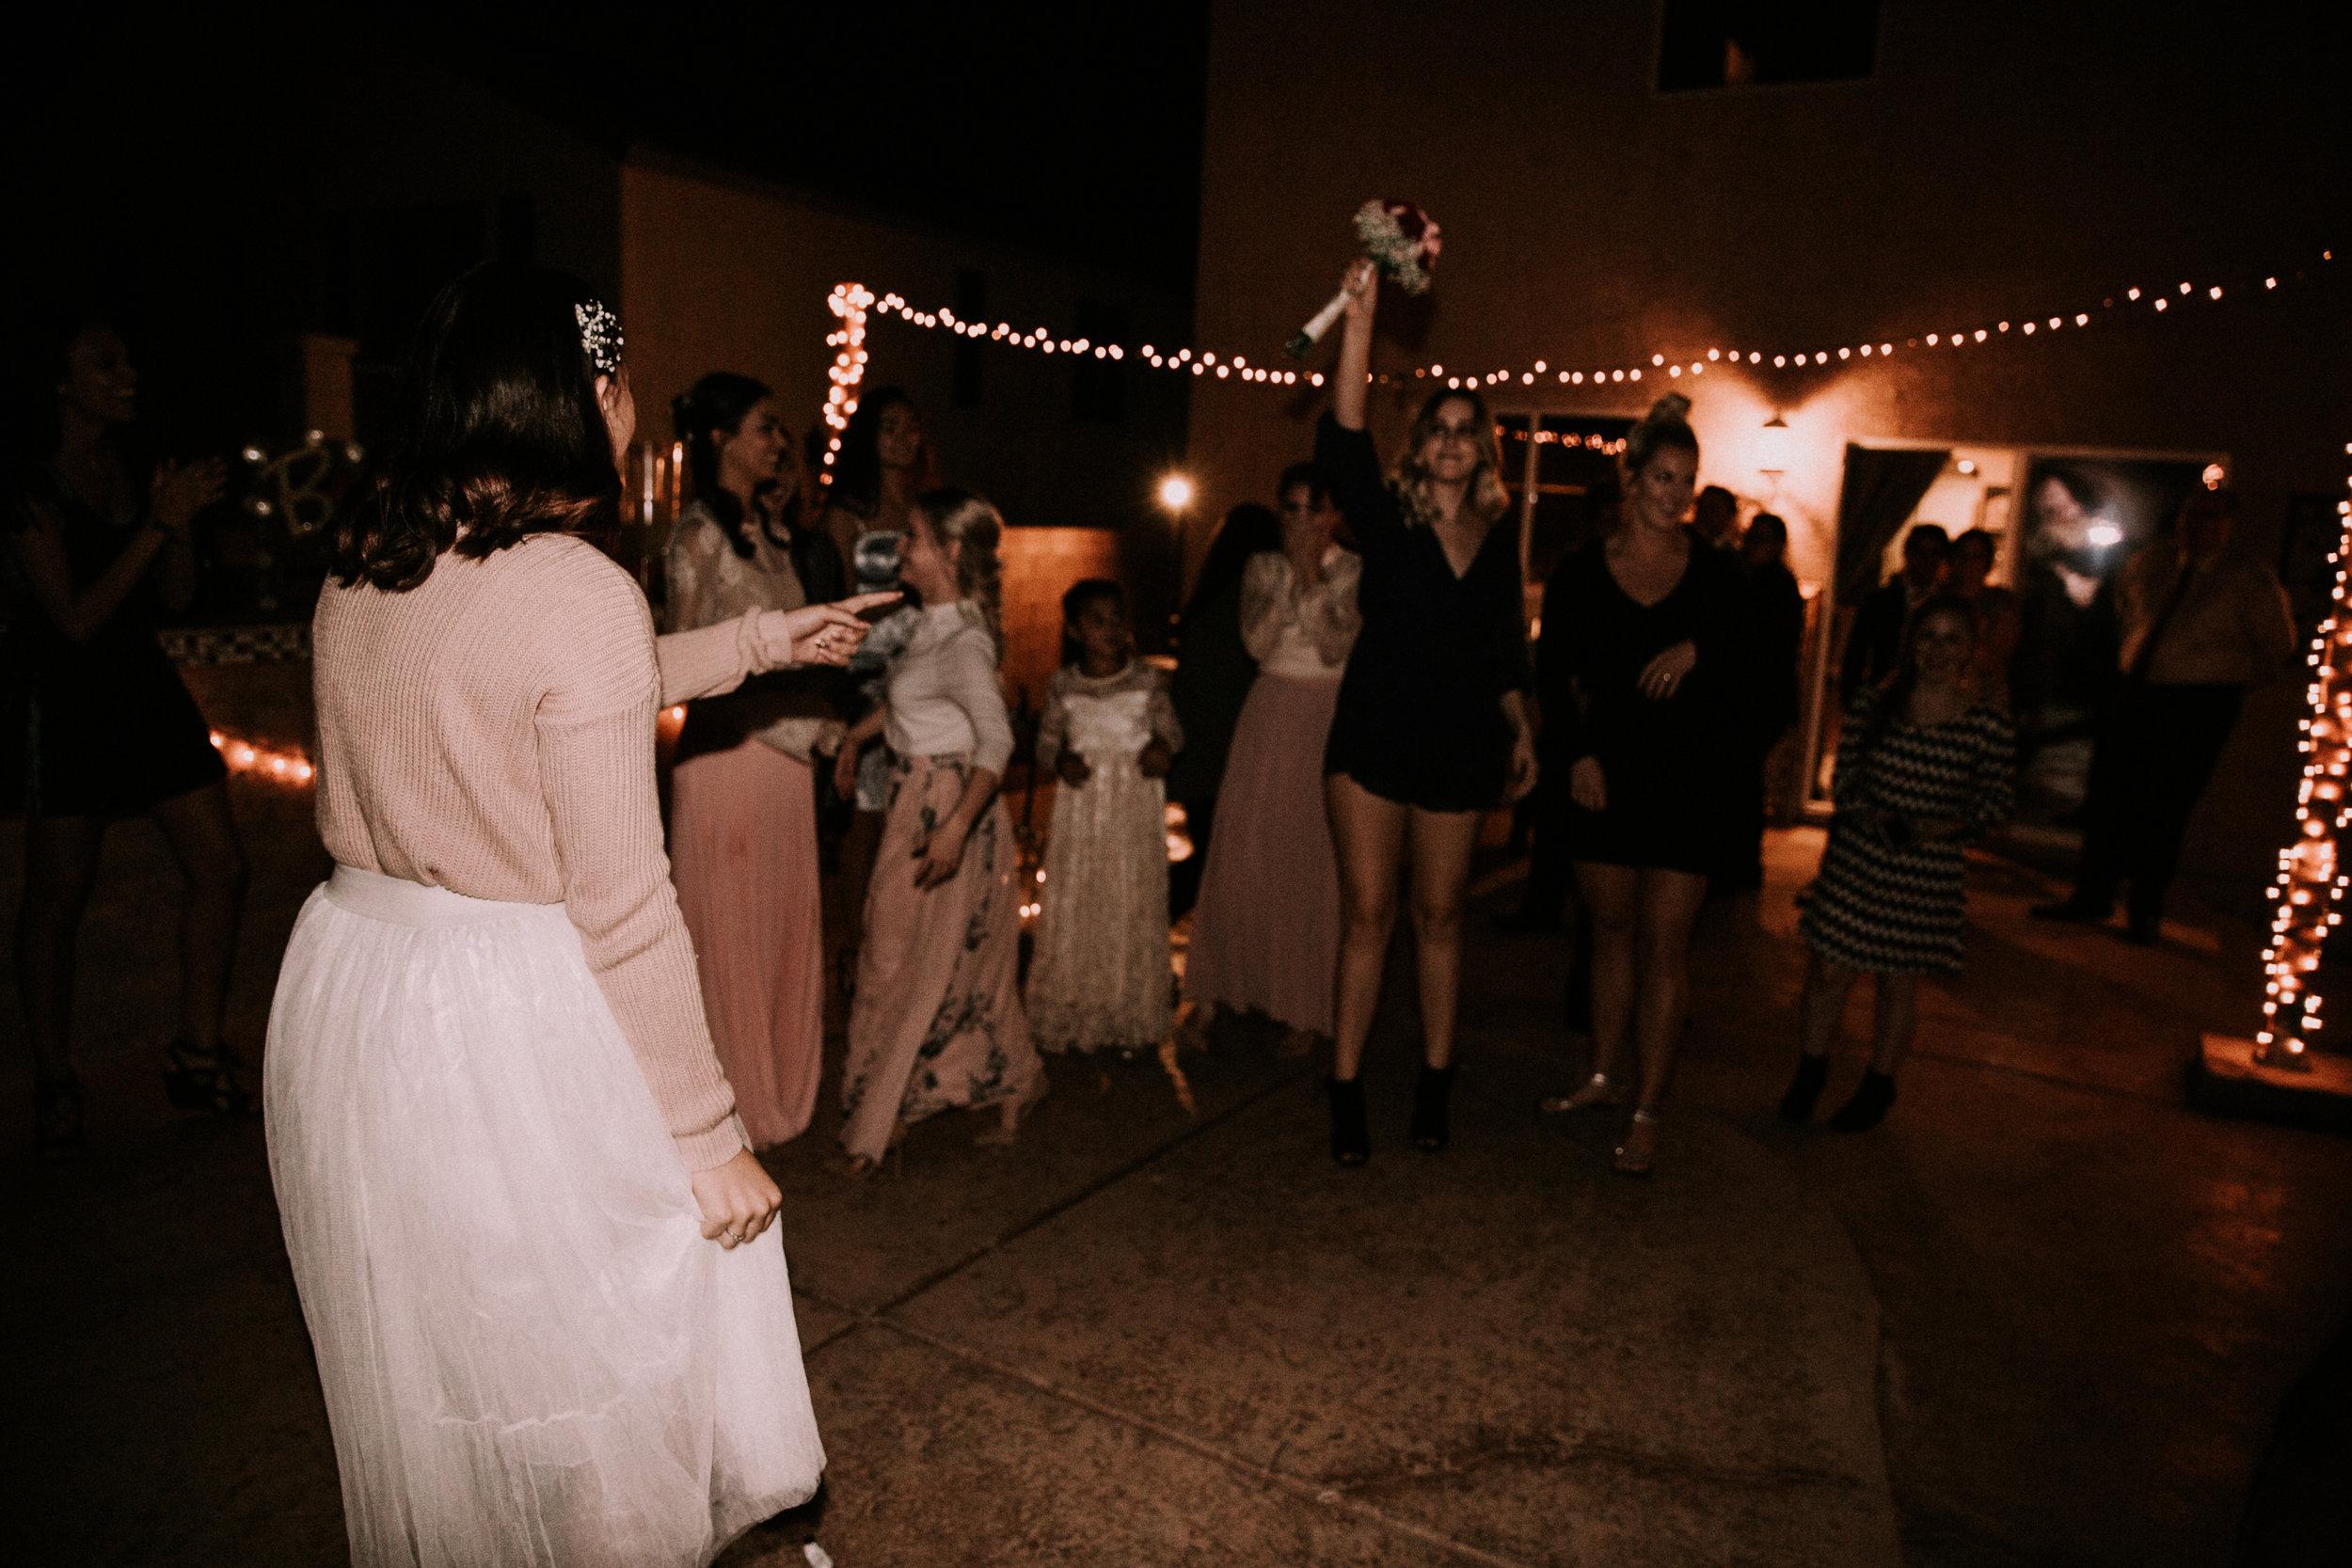 Jessica + Daniel - Kamra Fuller Photography - Henderson, NV - Las Vegas Wedding Photographer - Seattle Wedding Photographer - Portland Elopement Photographer - Portland Wedding Photographer - Wedding Details - Ring Shot - Detail Shot - Candid - Lifestyle - Documentary Style Photography - Wedding Photojournalist - PNW Elopement Photographer - White Lace Wedding Dress - Moody Photography - Bride - Groom - Getting Ready - Wedding Ceremony - Bridal Party - Bridesmaids - Maid of Honor - Groomsmen - Best Man - Wedding Reception